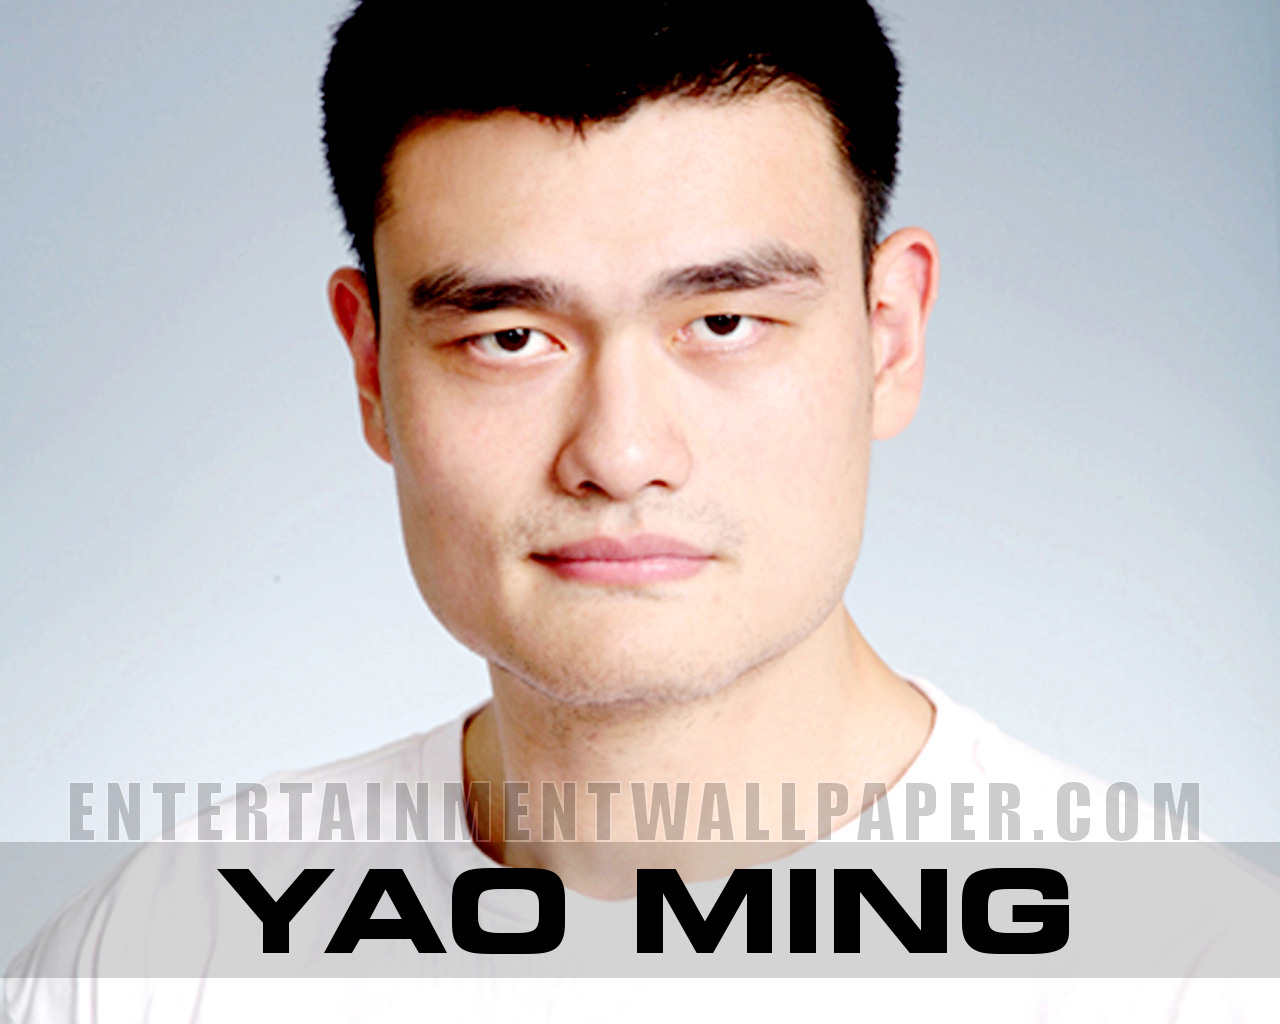 http://3.bp.blogspot.com/-T9aYvgHRDgs/Th_dLwqNrrI/AAAAAAAAAsk/LlBabuLPb7M/s1600/yao_ming01.jpg